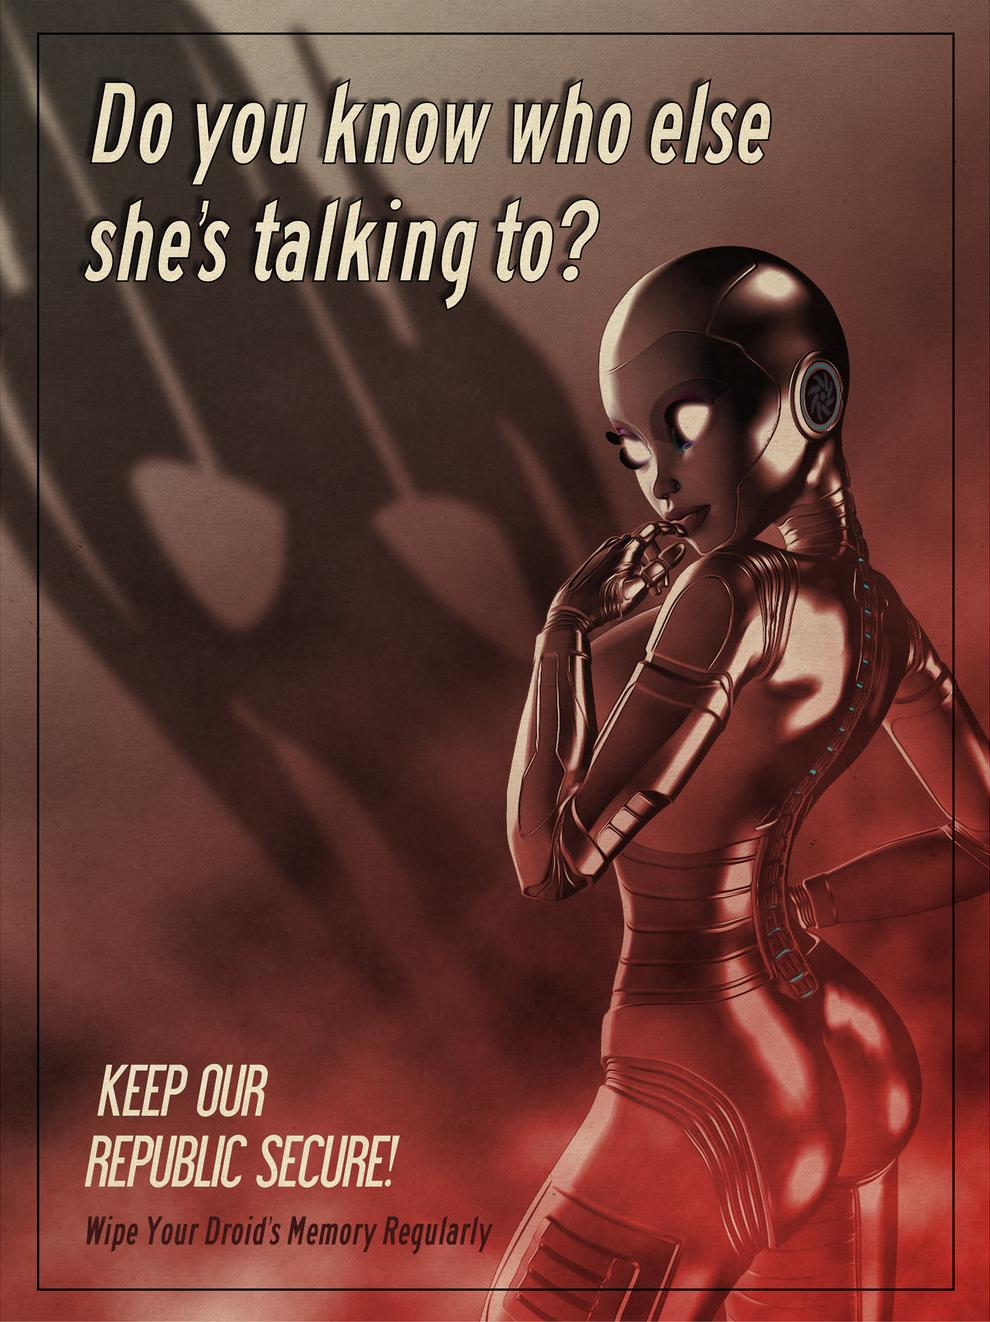 Anti-droid sentiment